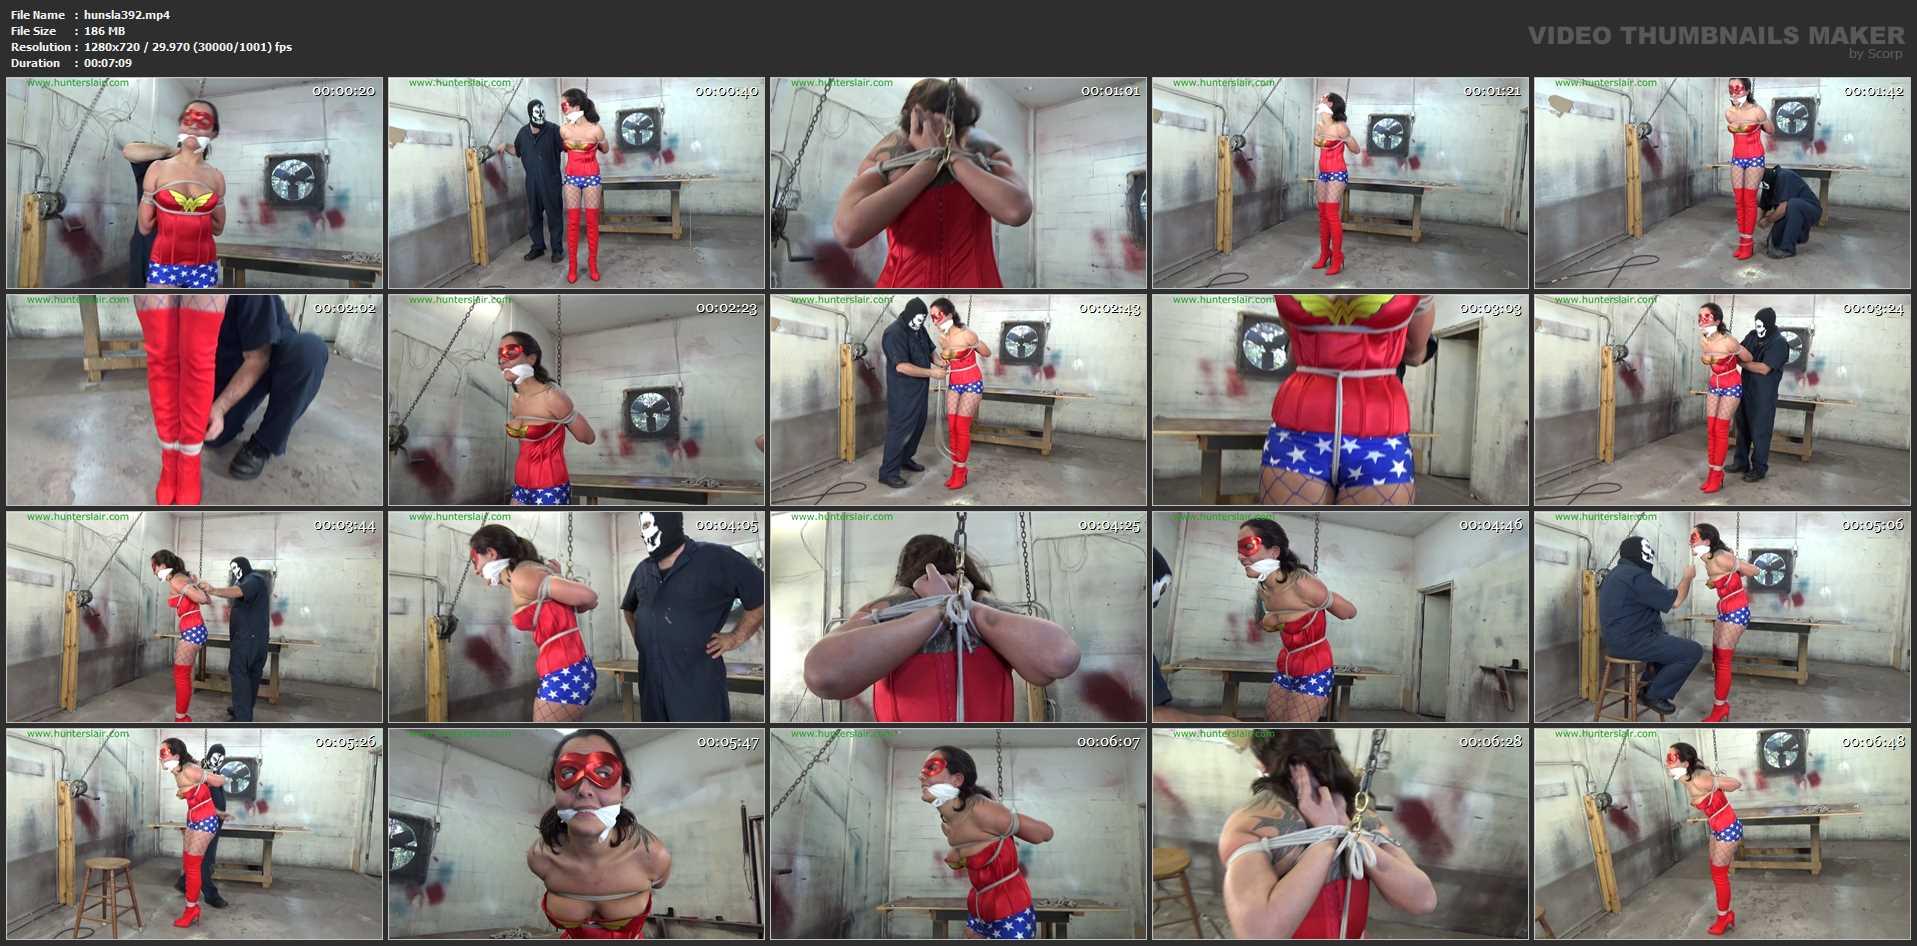 [HUNTERSLAIR] Wonder Broad Wrapped in rope. Featuring: Roxanne Rae [HD][720p][MP4]